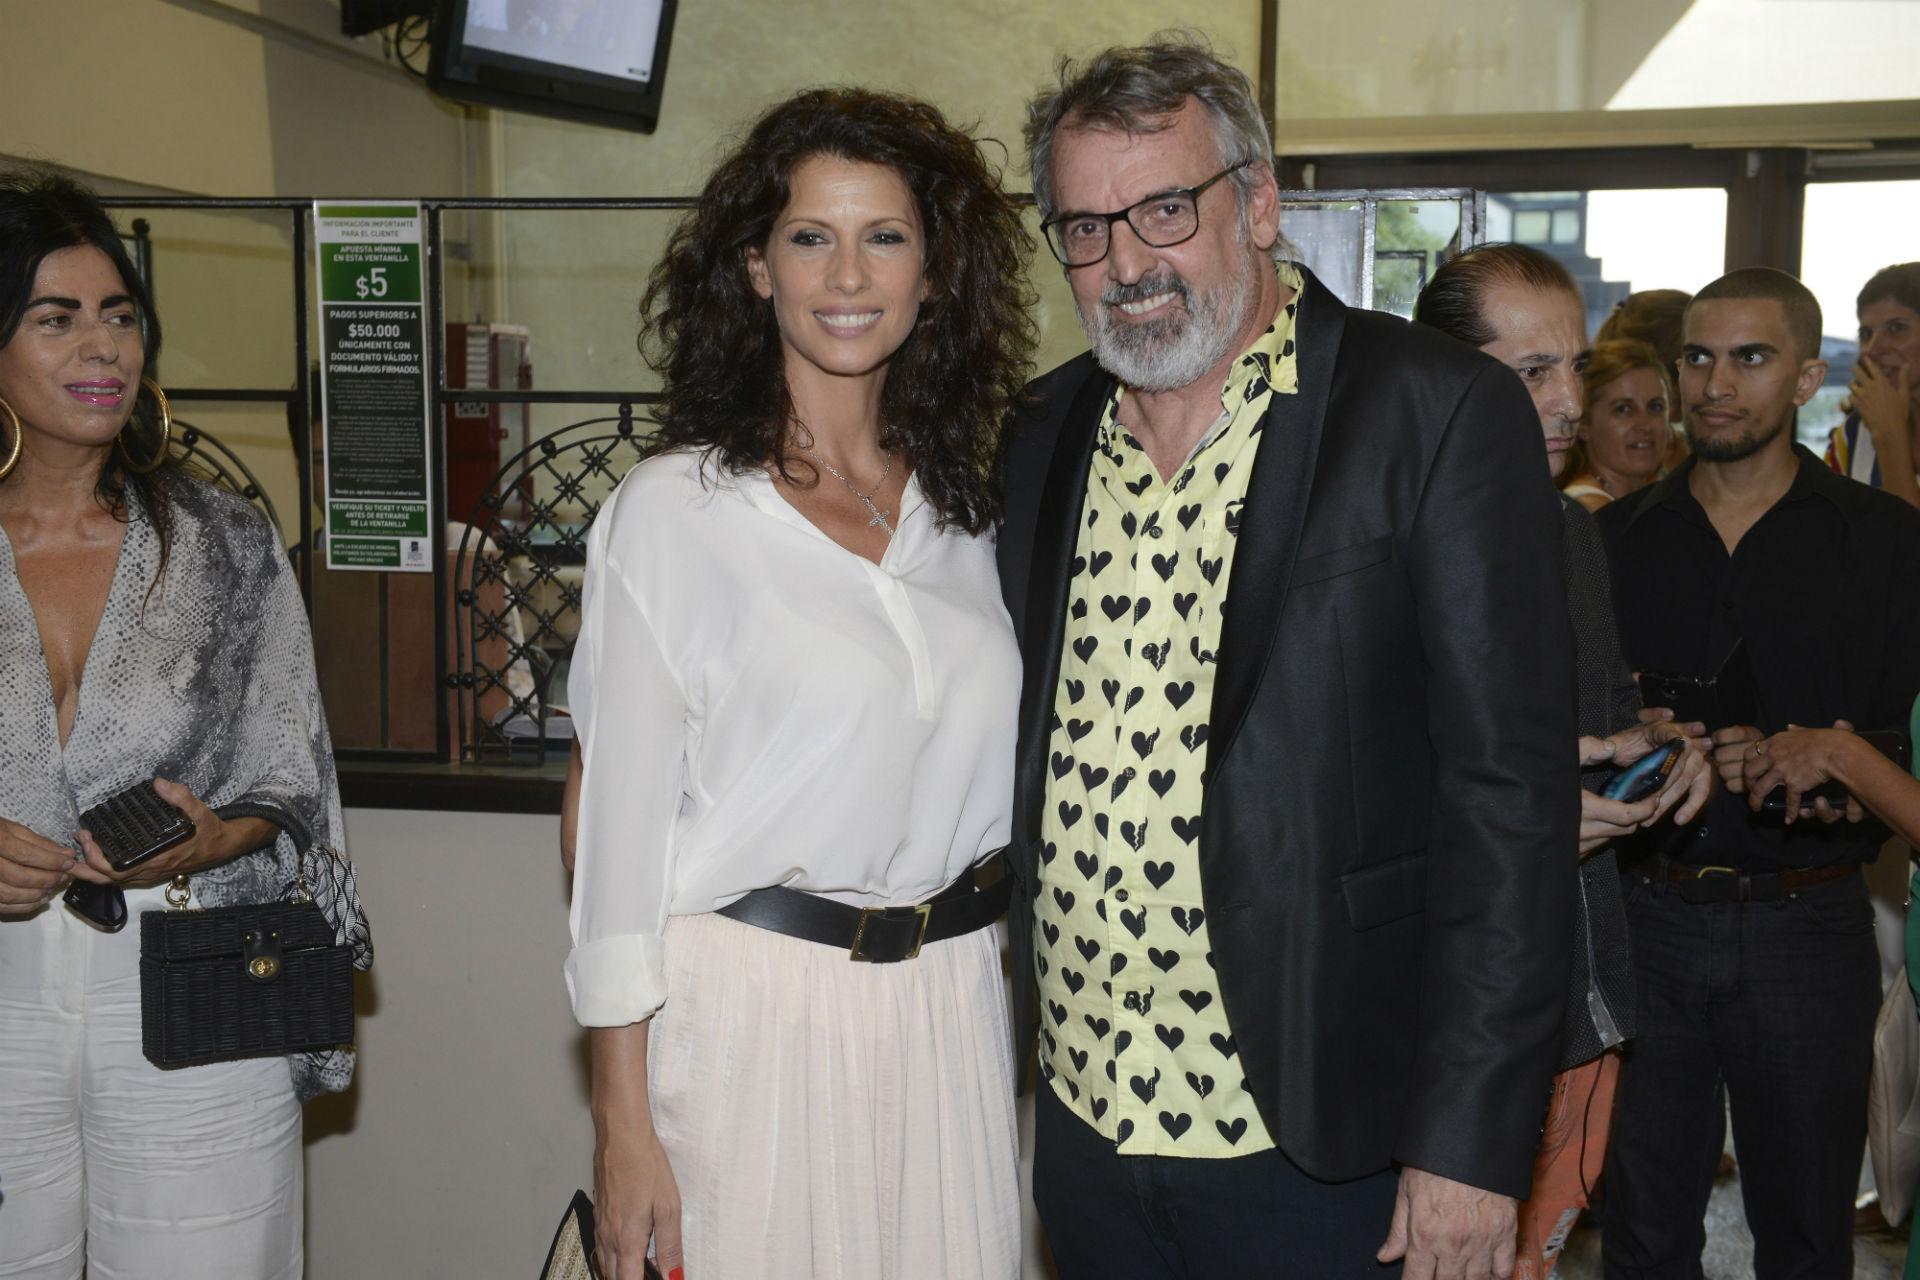 Analía Maiorana y Benito Fernández. (Foto Fabián Mattiazzi/GENTE)